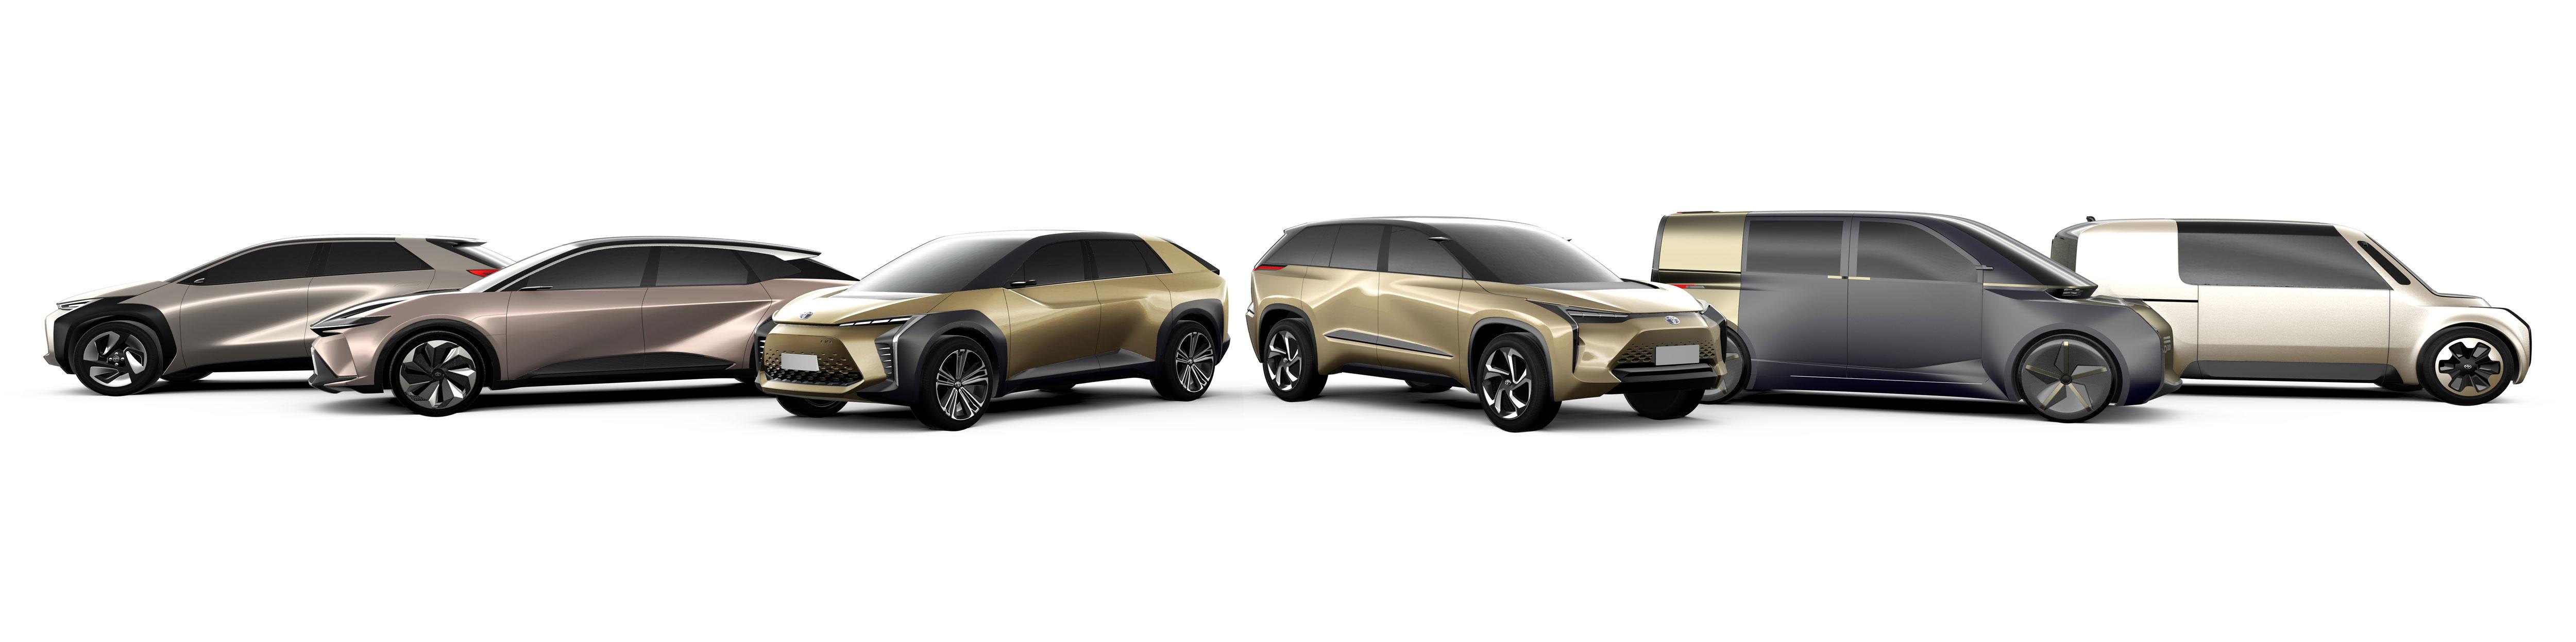 Toyota-Elektroautos-ab-2020-global